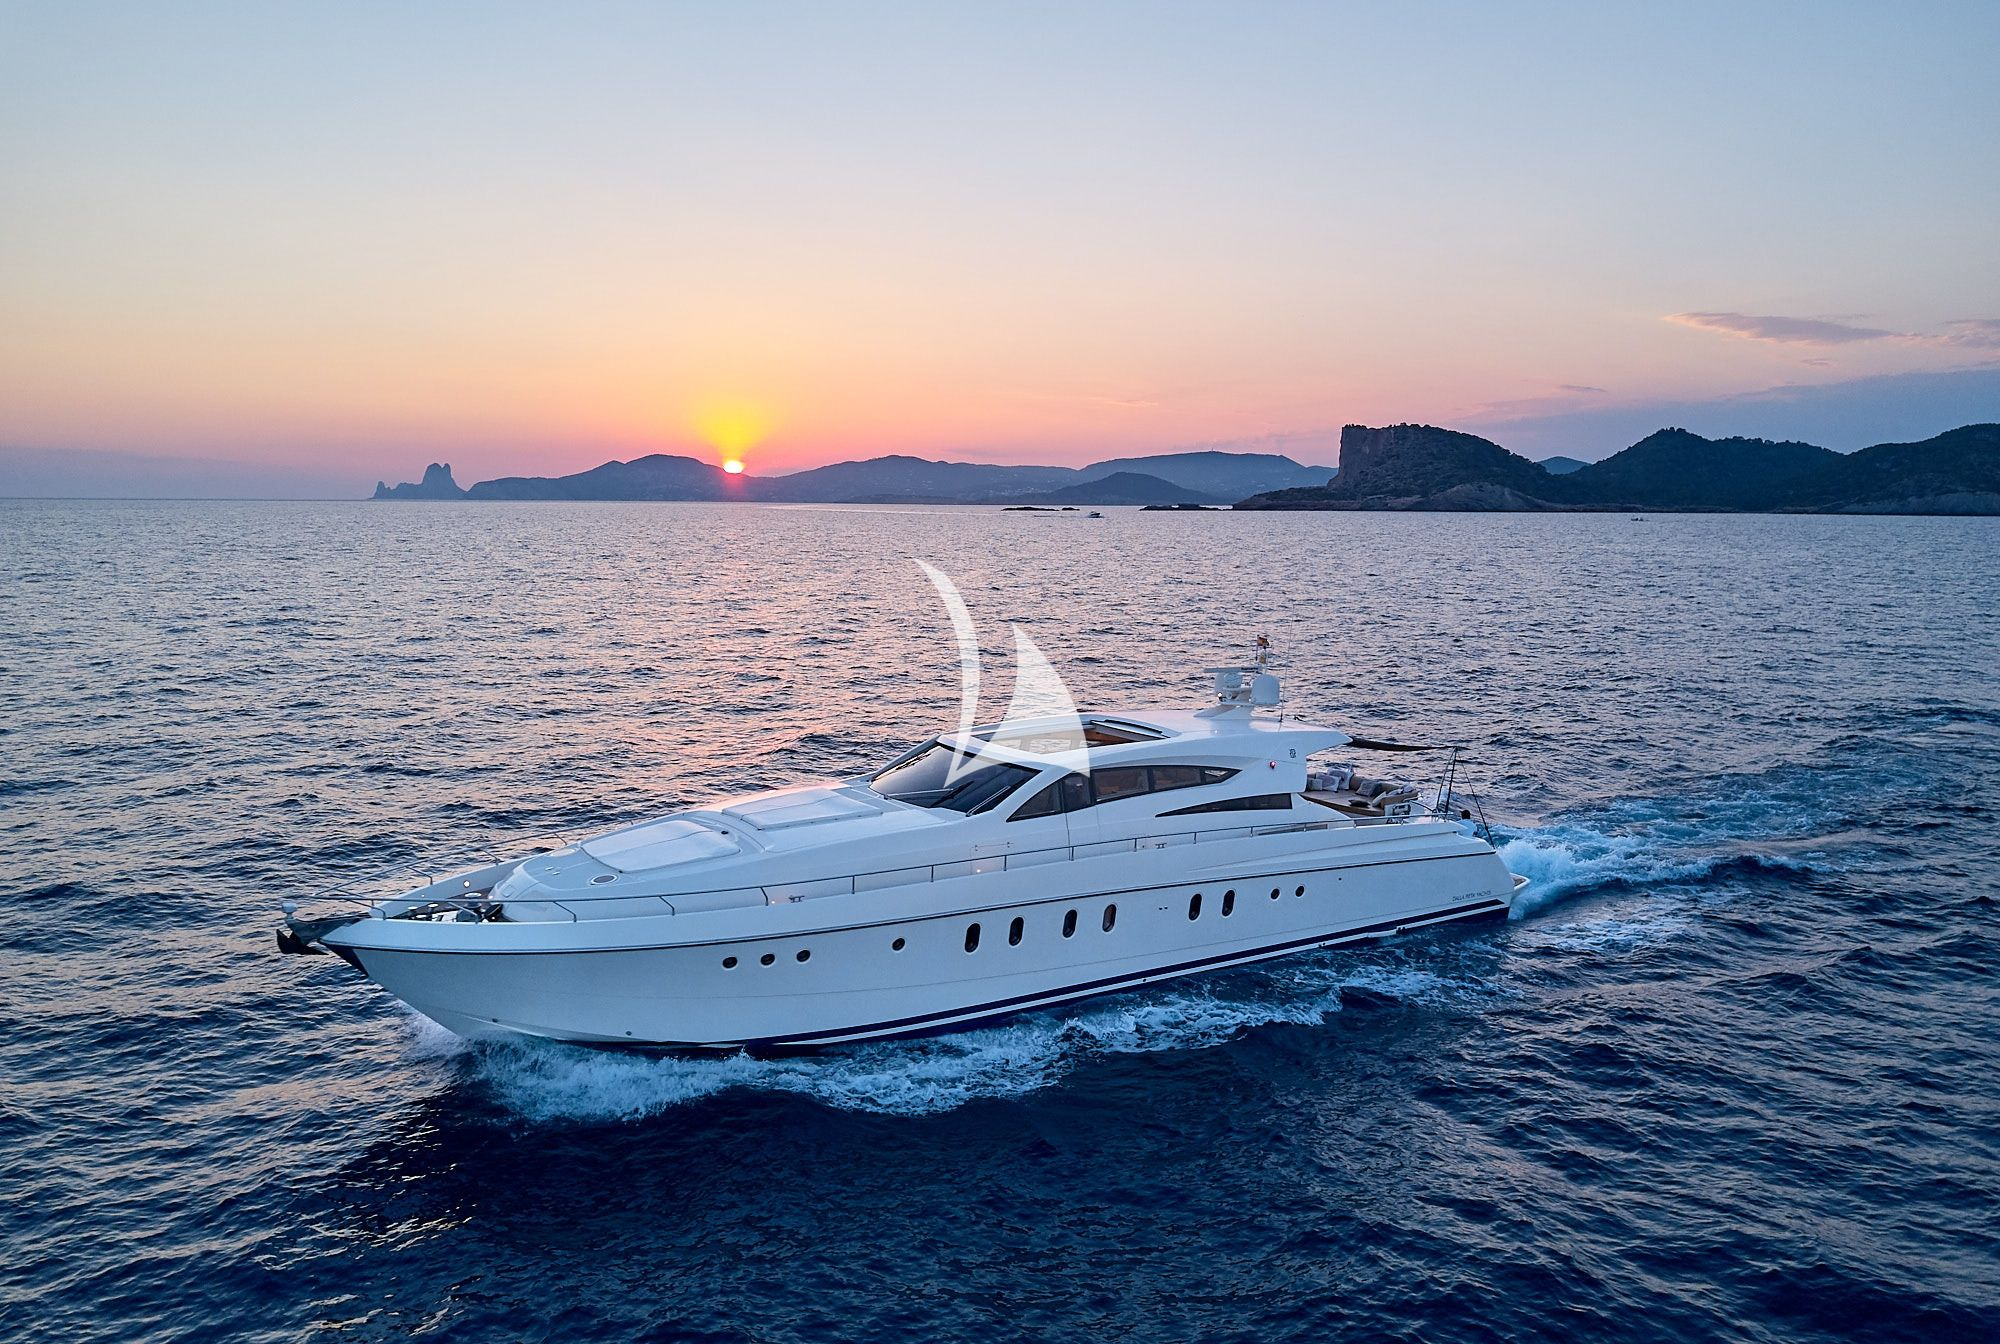 OCEANS 5 - Dalla Pieta 26m - 3 Cabins - Naples - Sardinia - Porto Cervo - Corsica